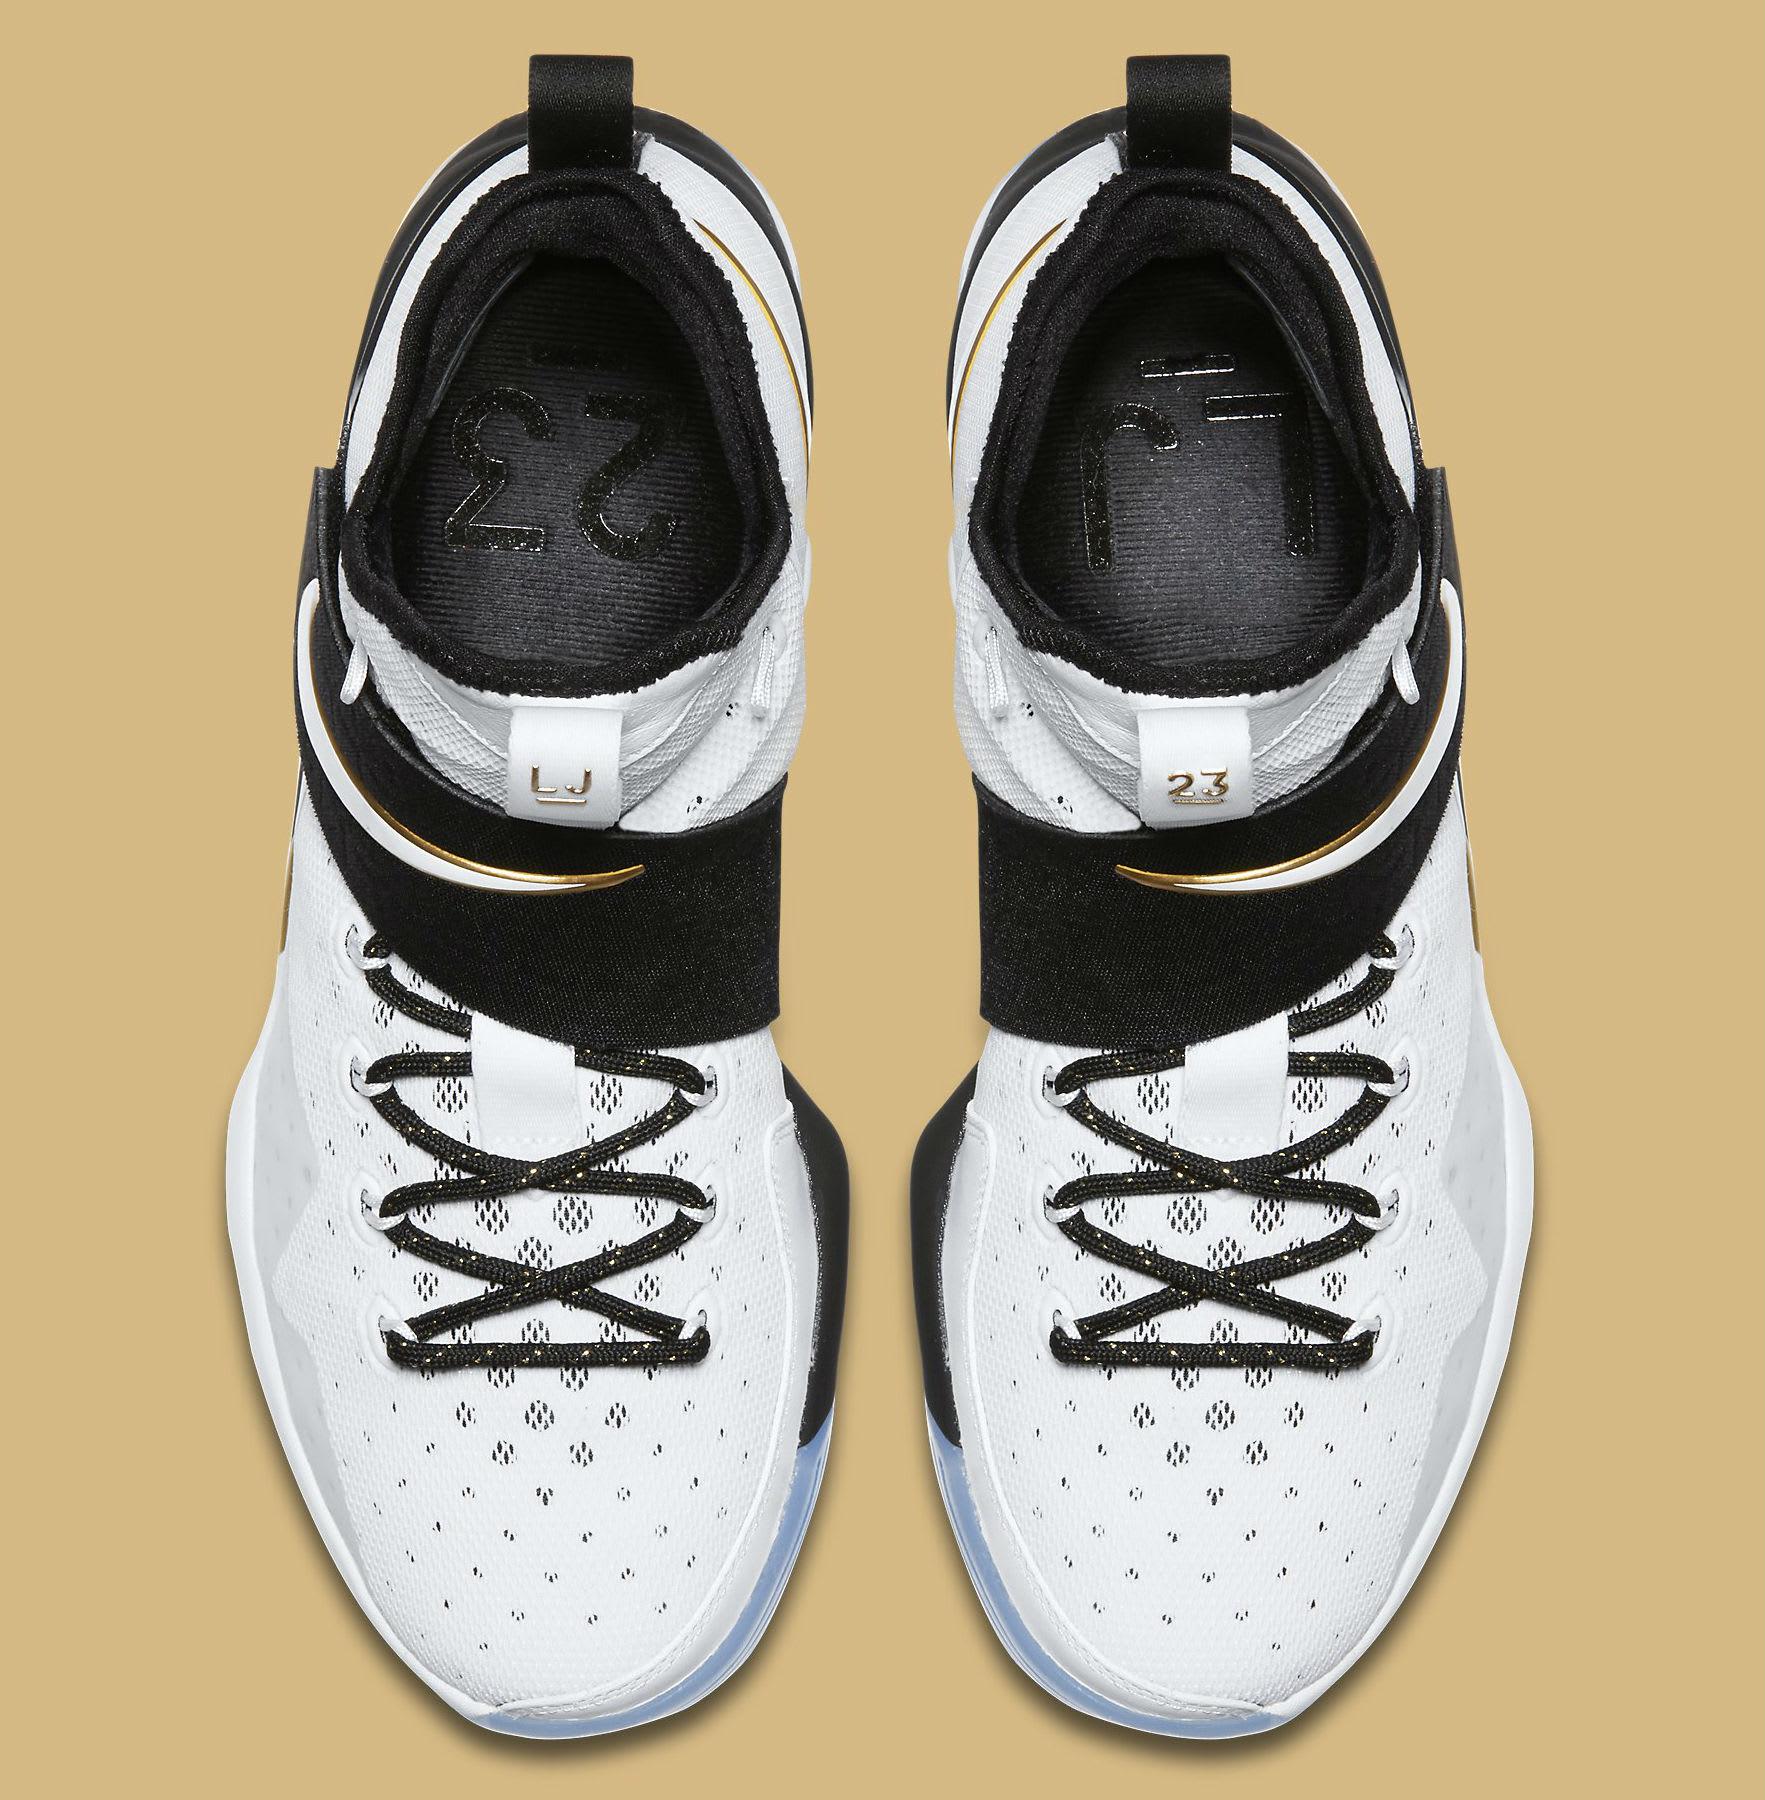 585bbe47515 Nike LeBron 14 BHM Release Date Top 860634-100